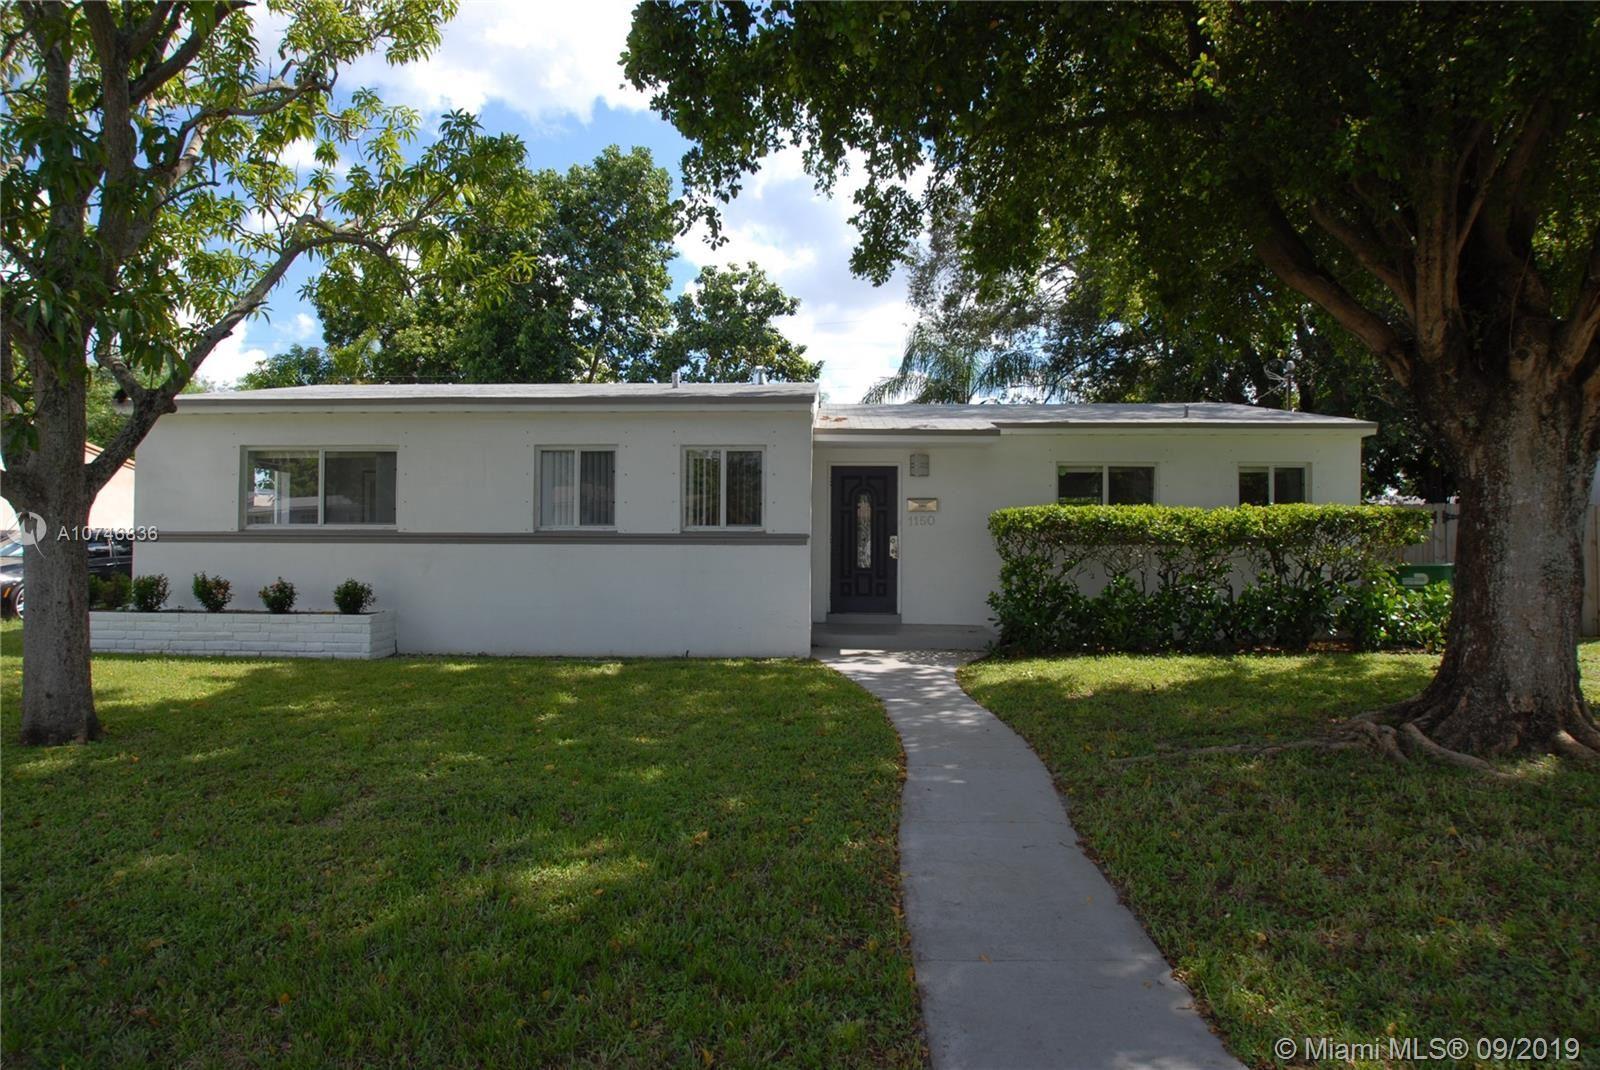 1150 NW 185th Ter, Miami Gardens, FL 33169 - #: A10746836